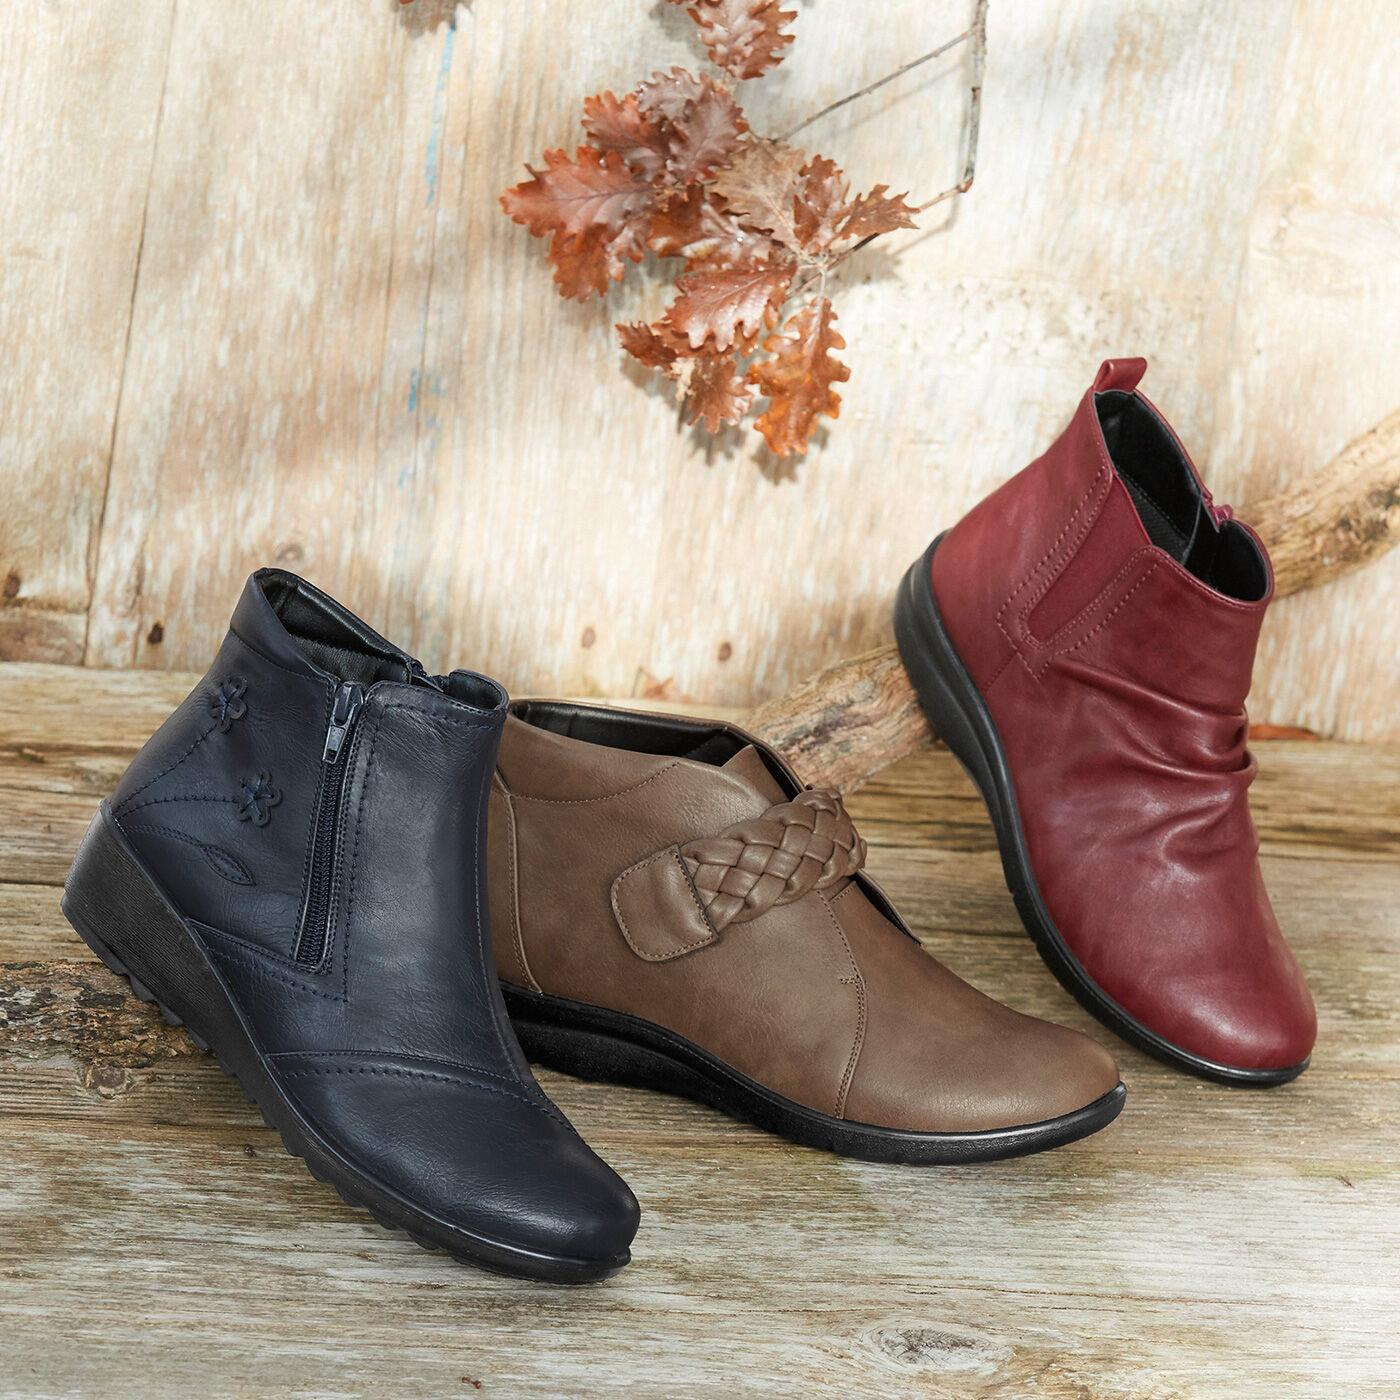 Inspire Me | Autumn Footwear | Flexisole Collection | Flexisole Flower Detail Boots | Flexisole Plaited Strap Boots | Flexisole Slouch Boots | By Cotton Traders